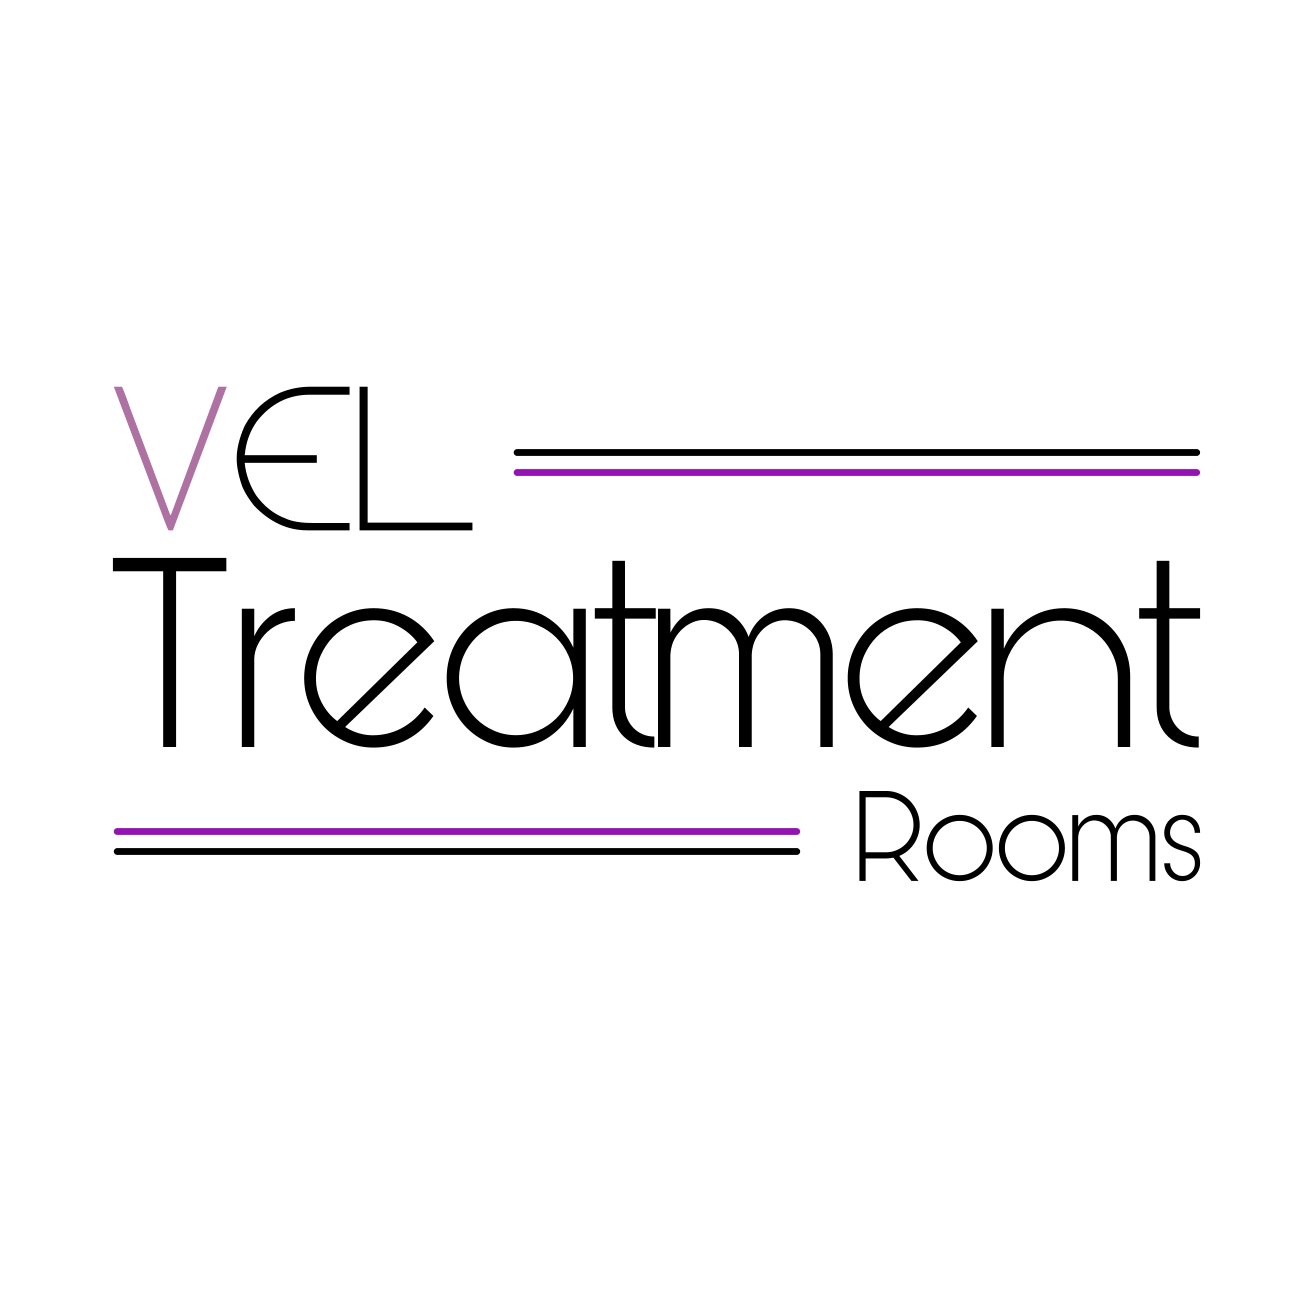 VEL Logo Refresh (Circle)